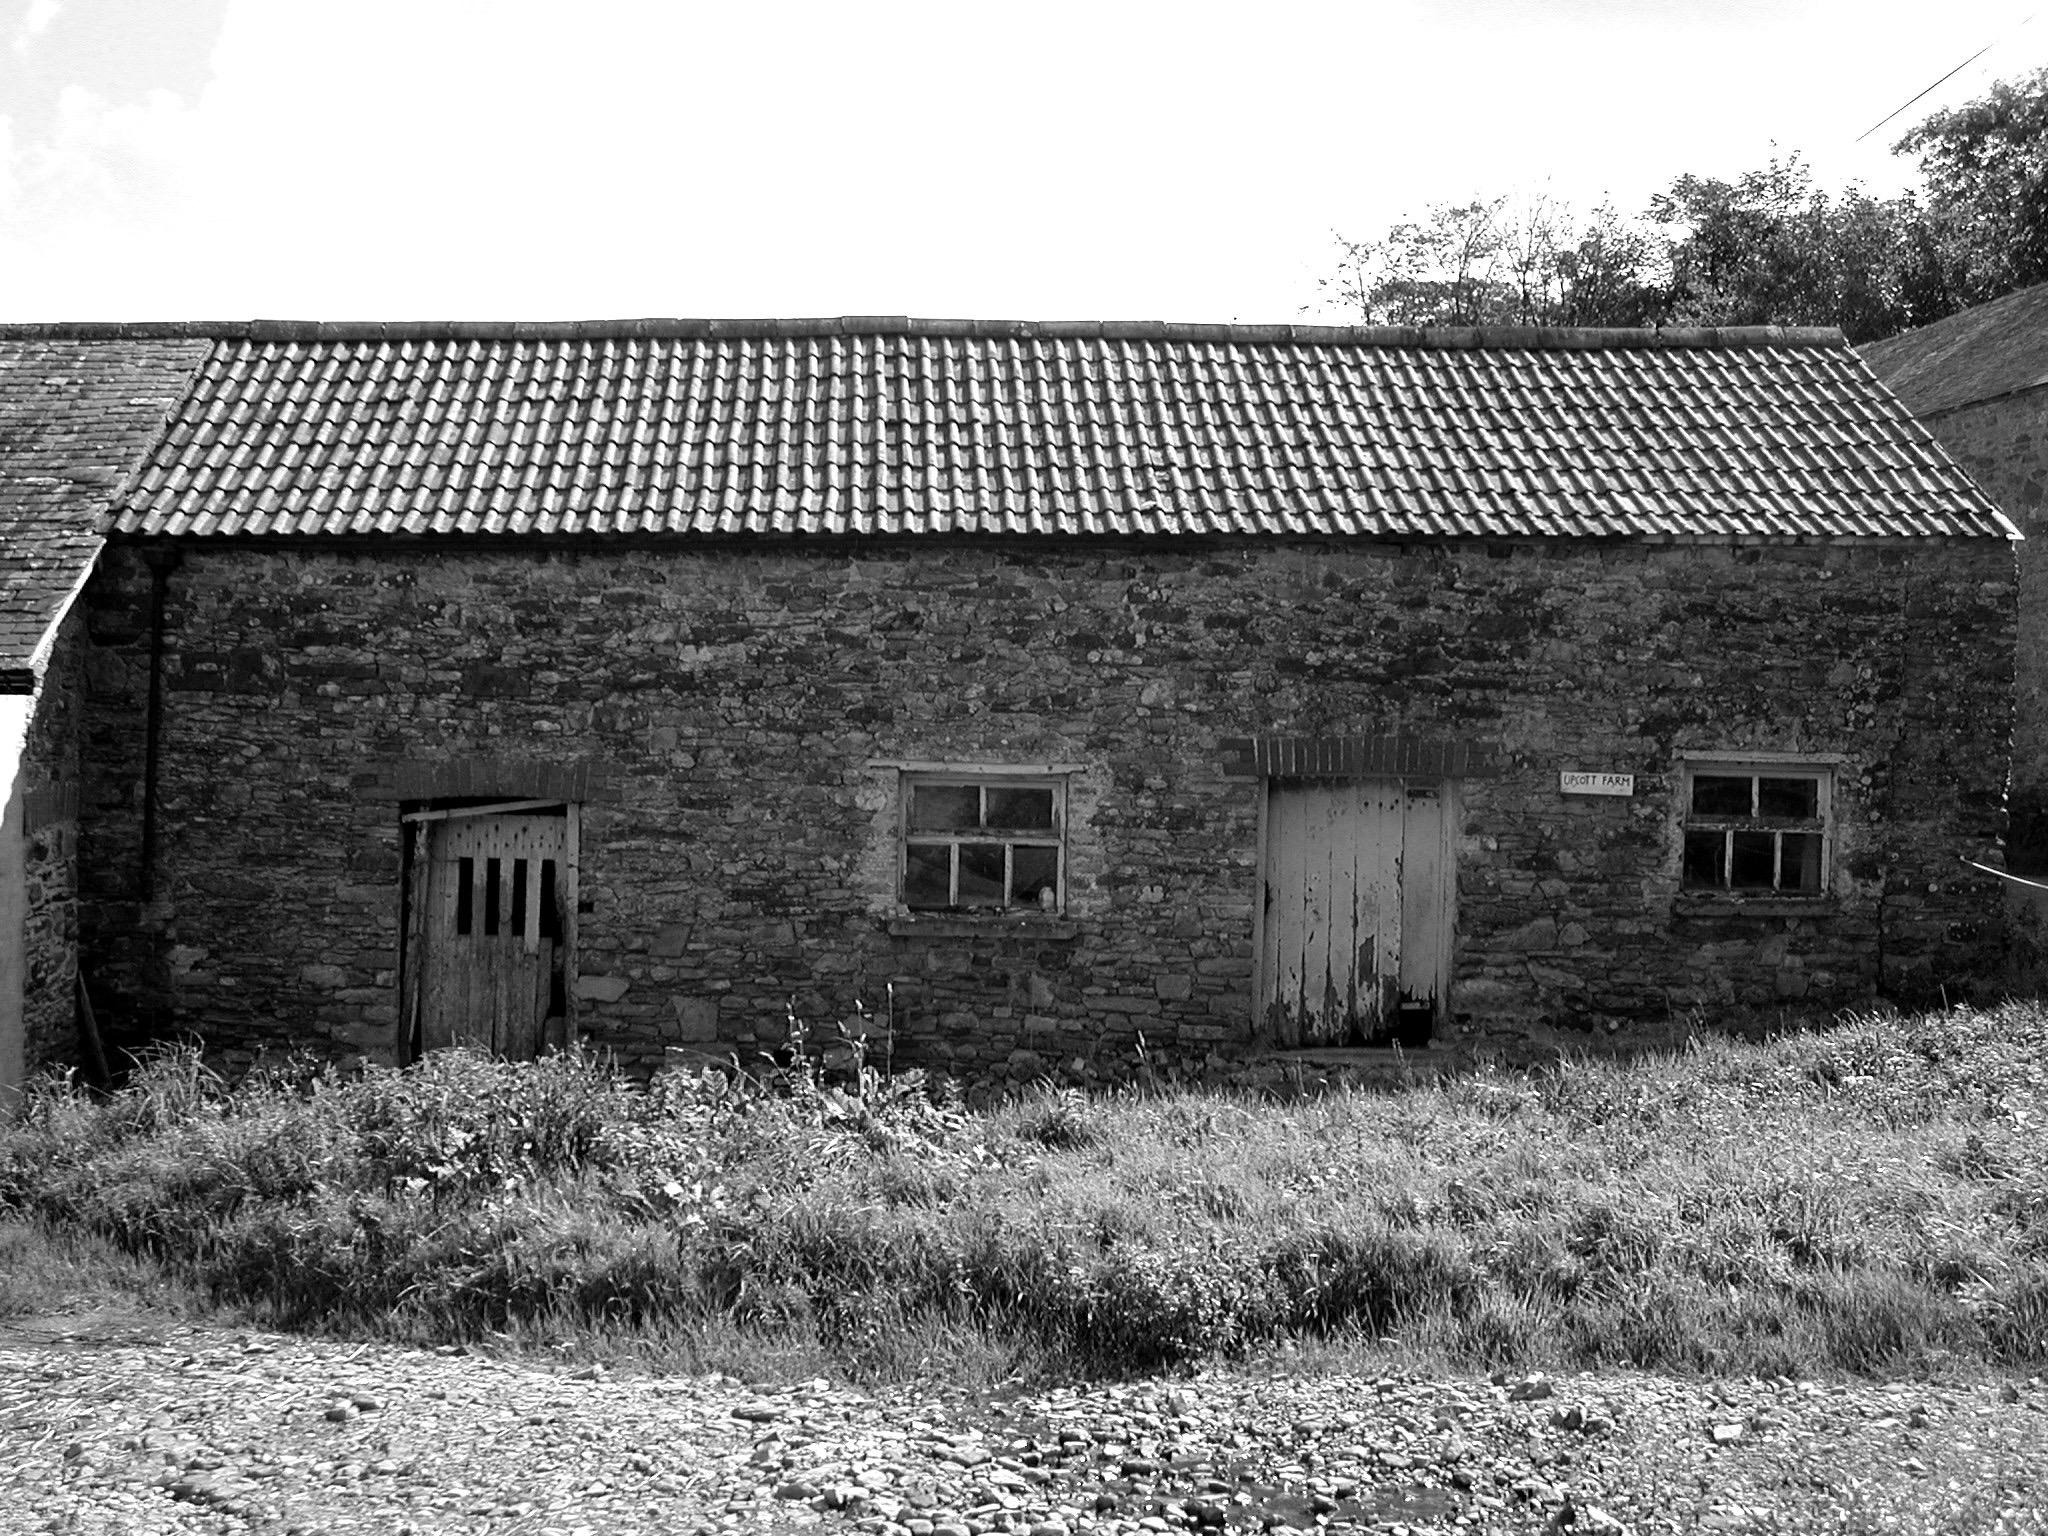 upcott farm lambshed bw.jpg